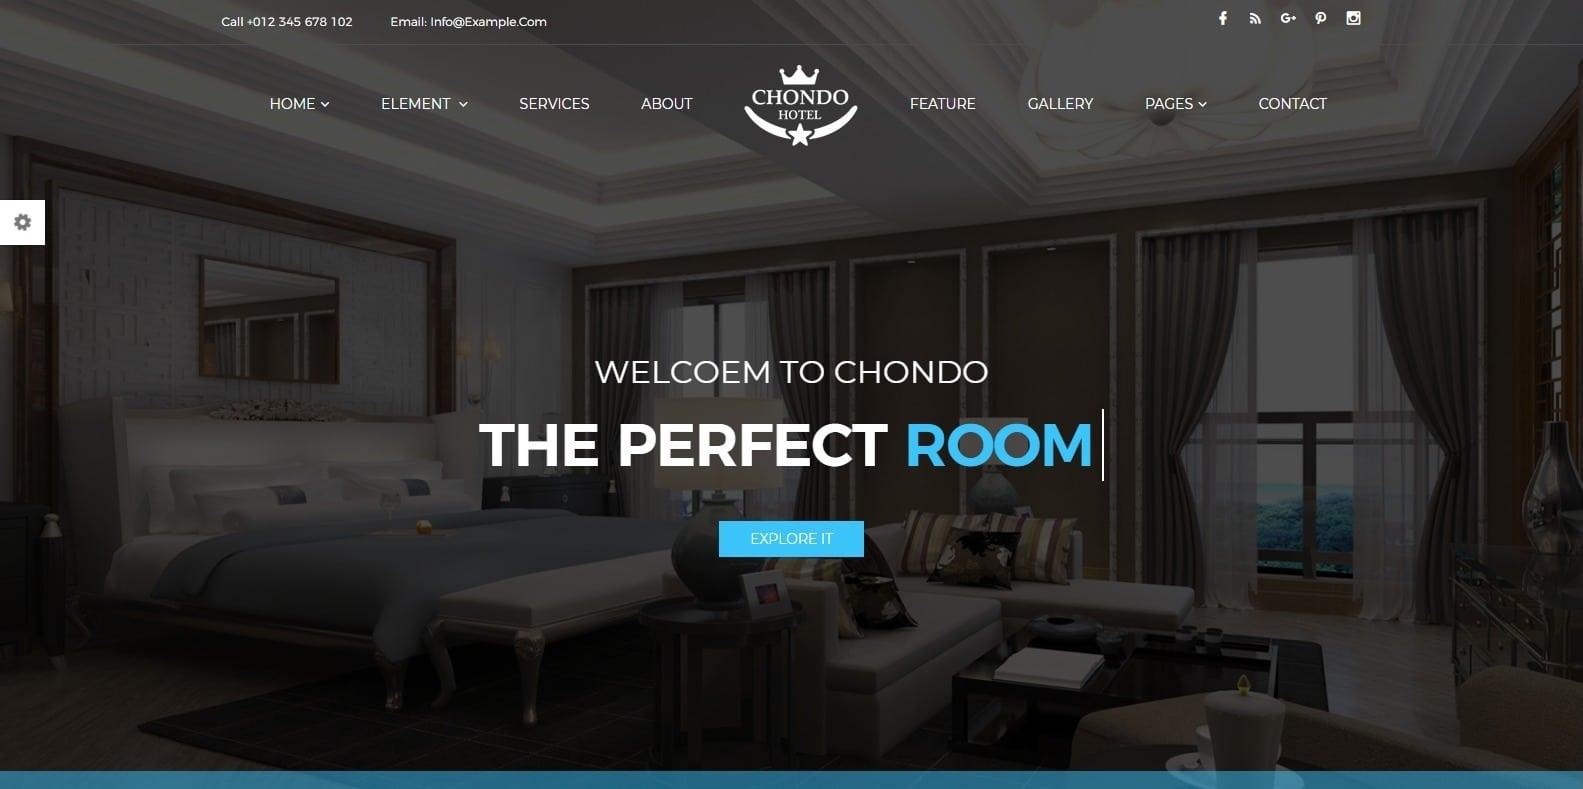 chondo-hotel-template